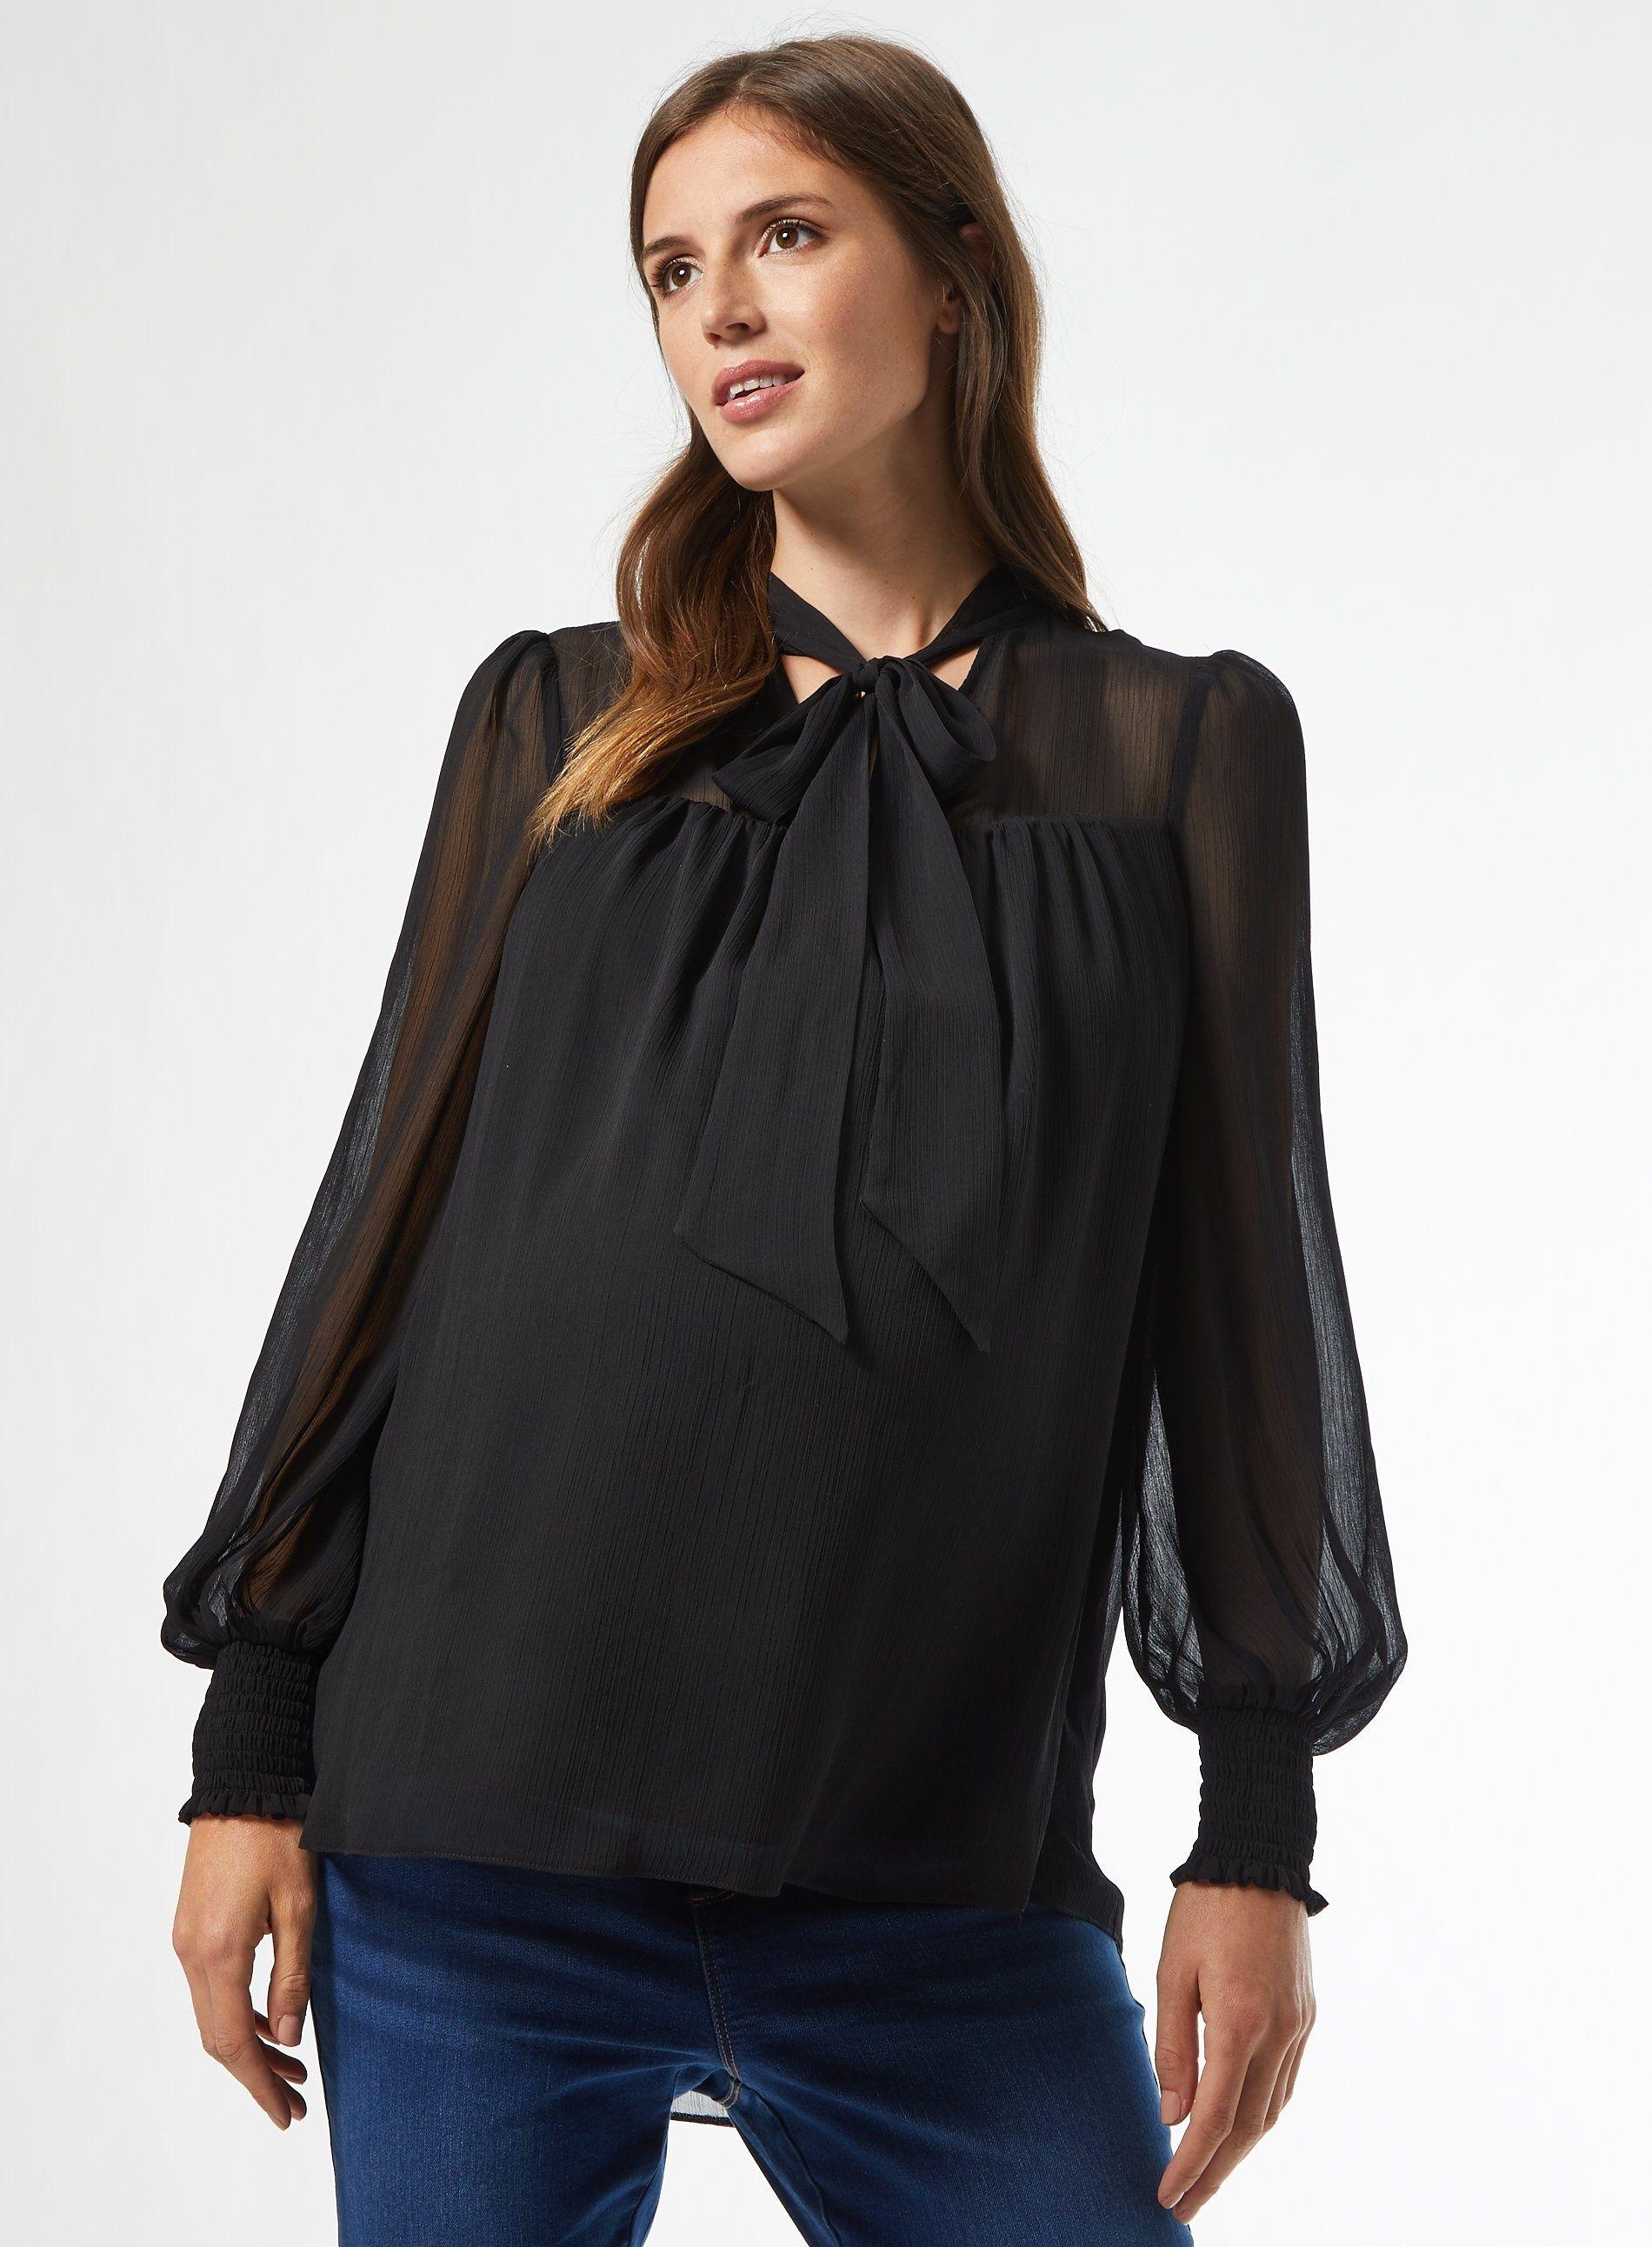 Dorothy Perkins Womens Maternity Black Long Sleeve Tie Top Shirt Blouse